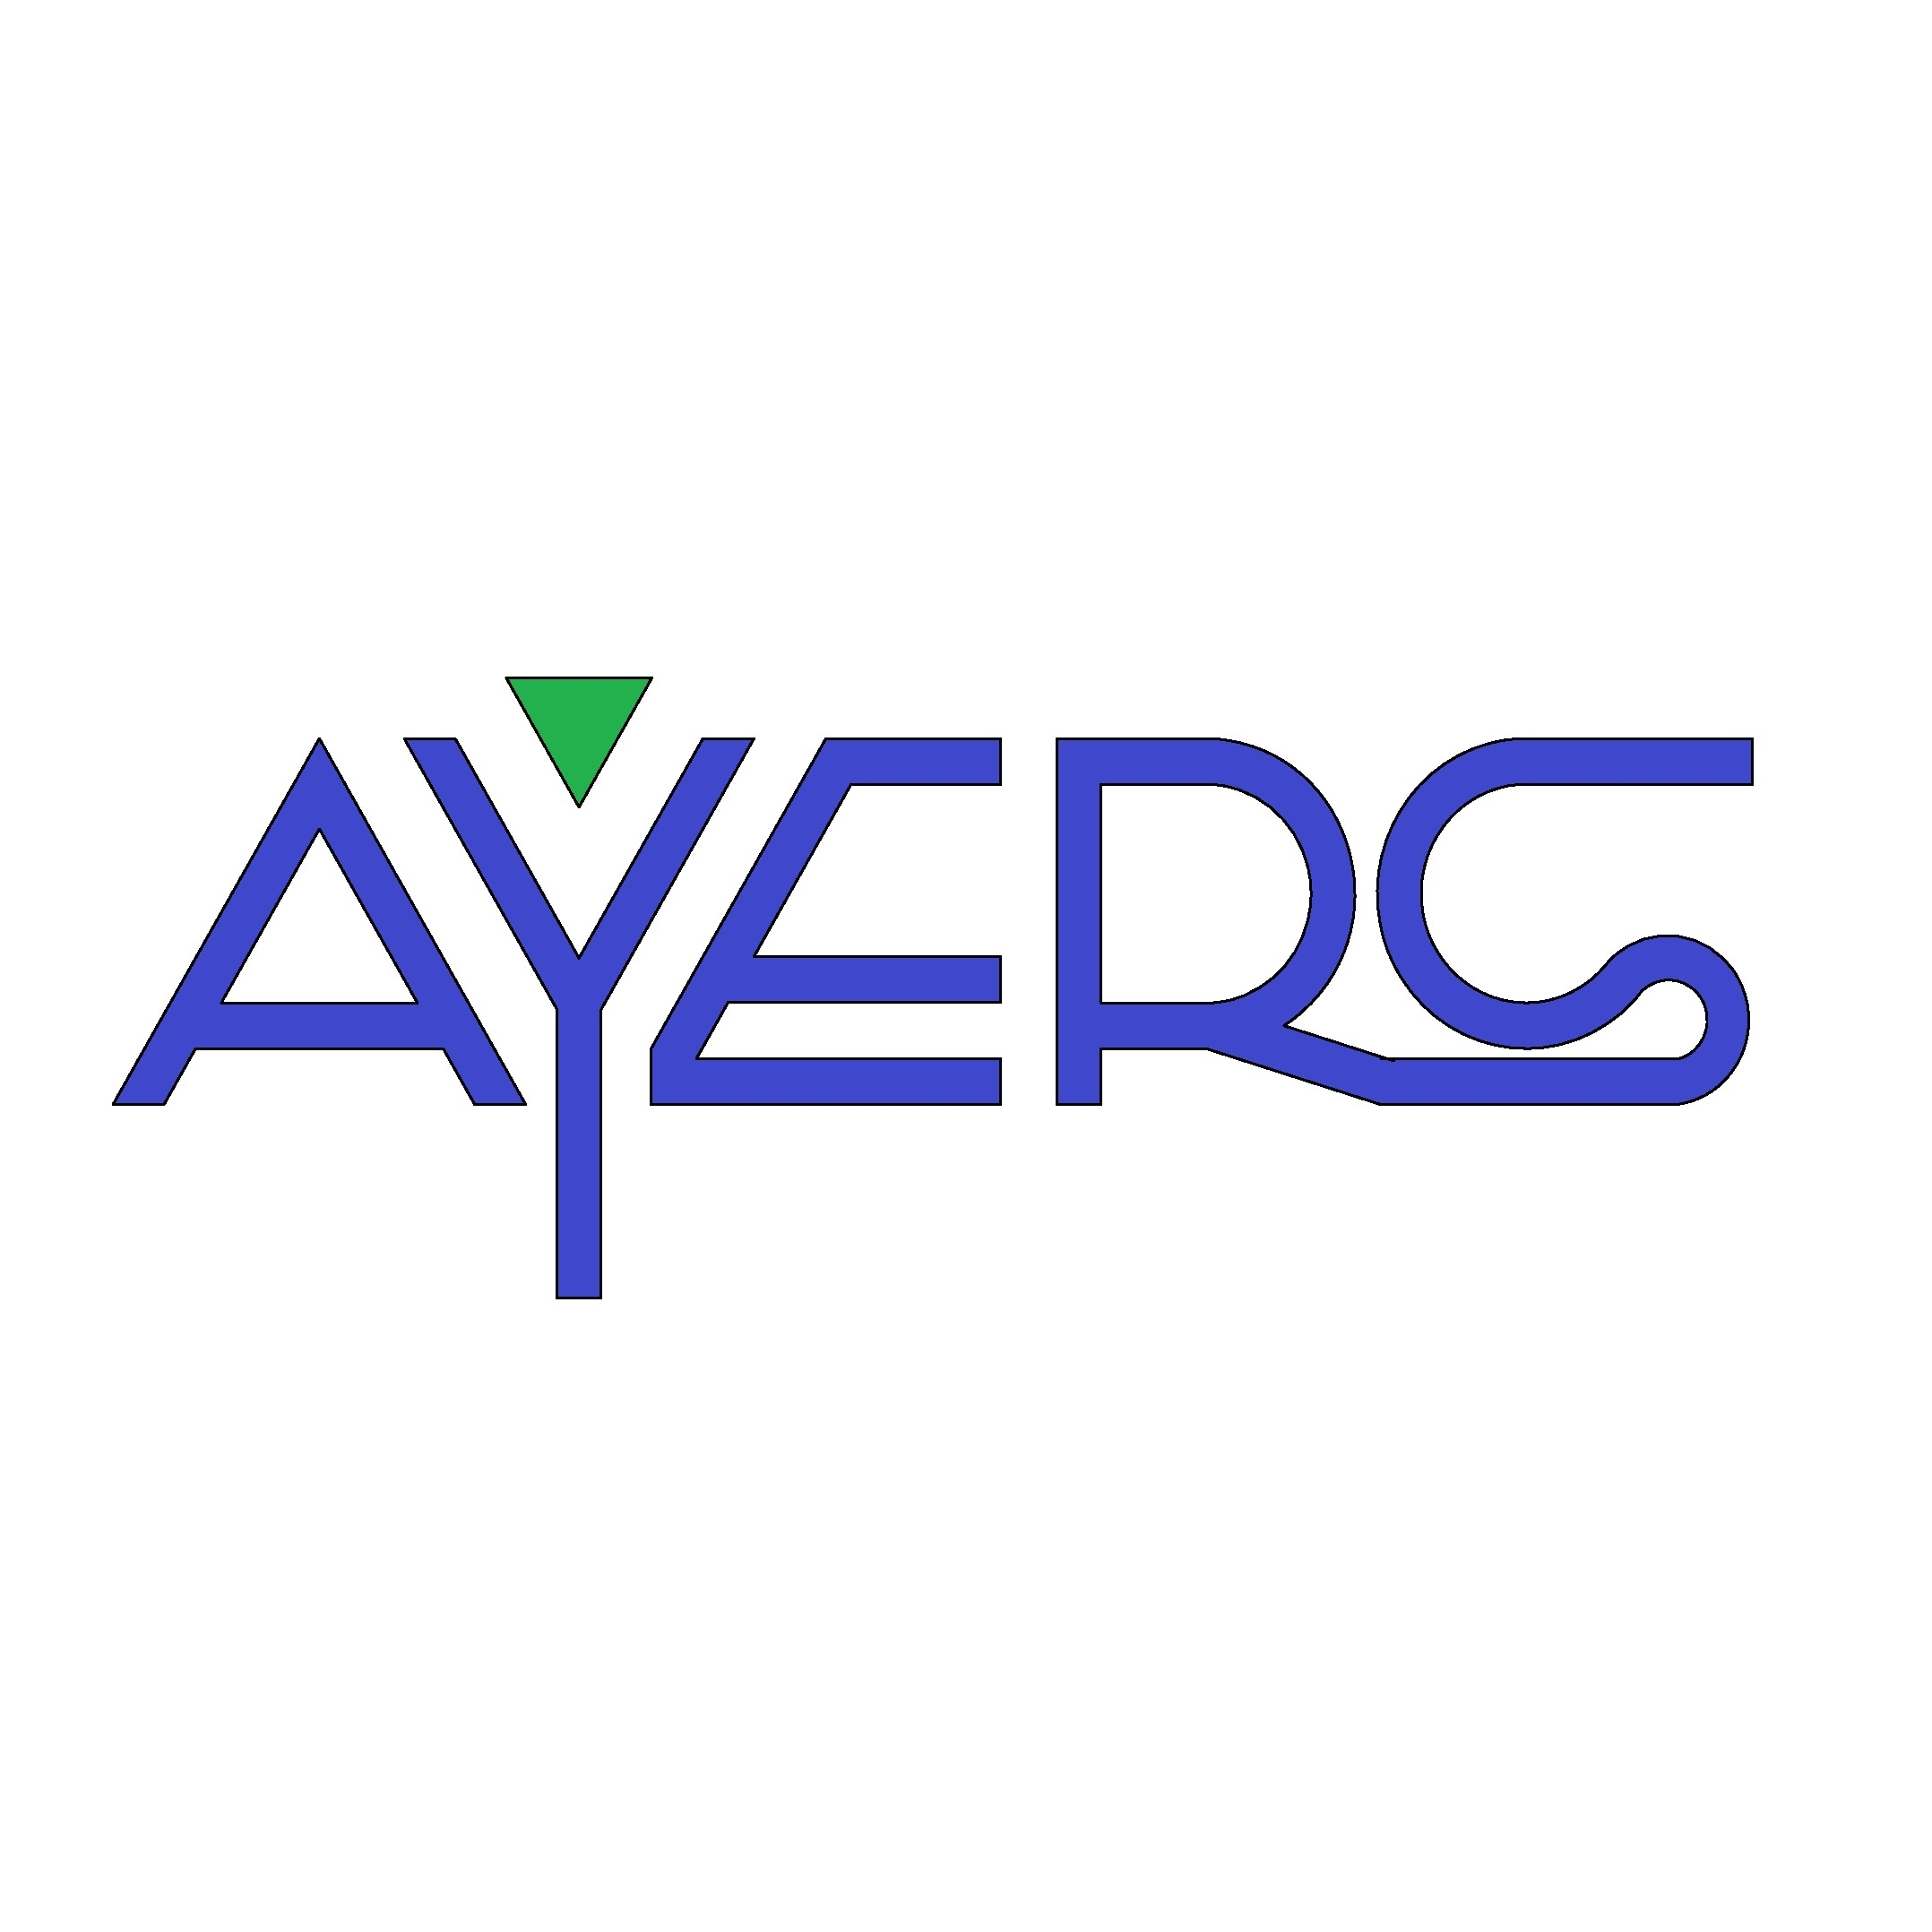 Ayers Steel